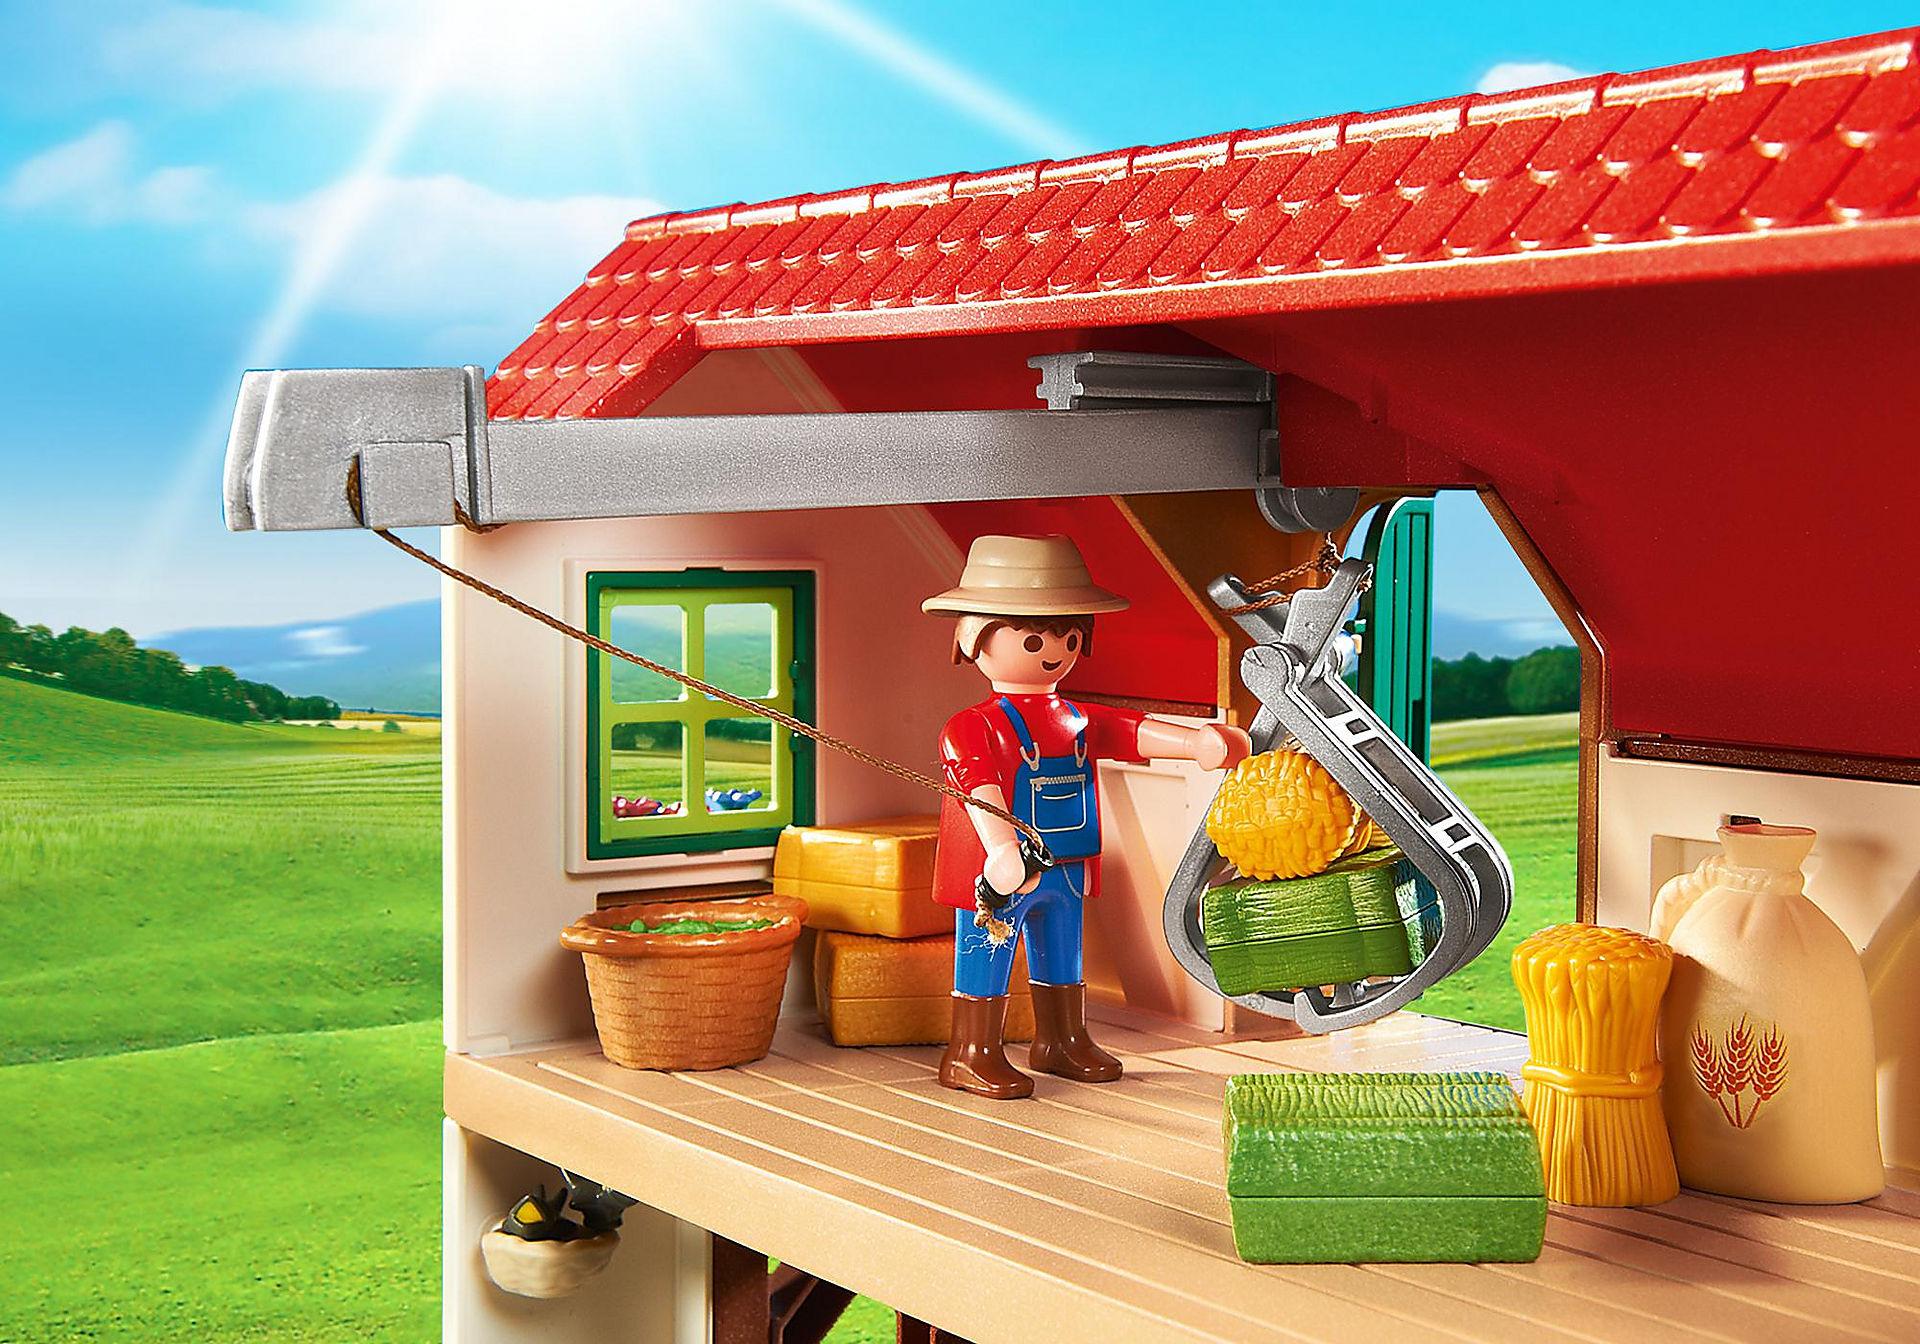 http://media.playmobil.com/i/playmobil/6120_product_extra3/Stor gård